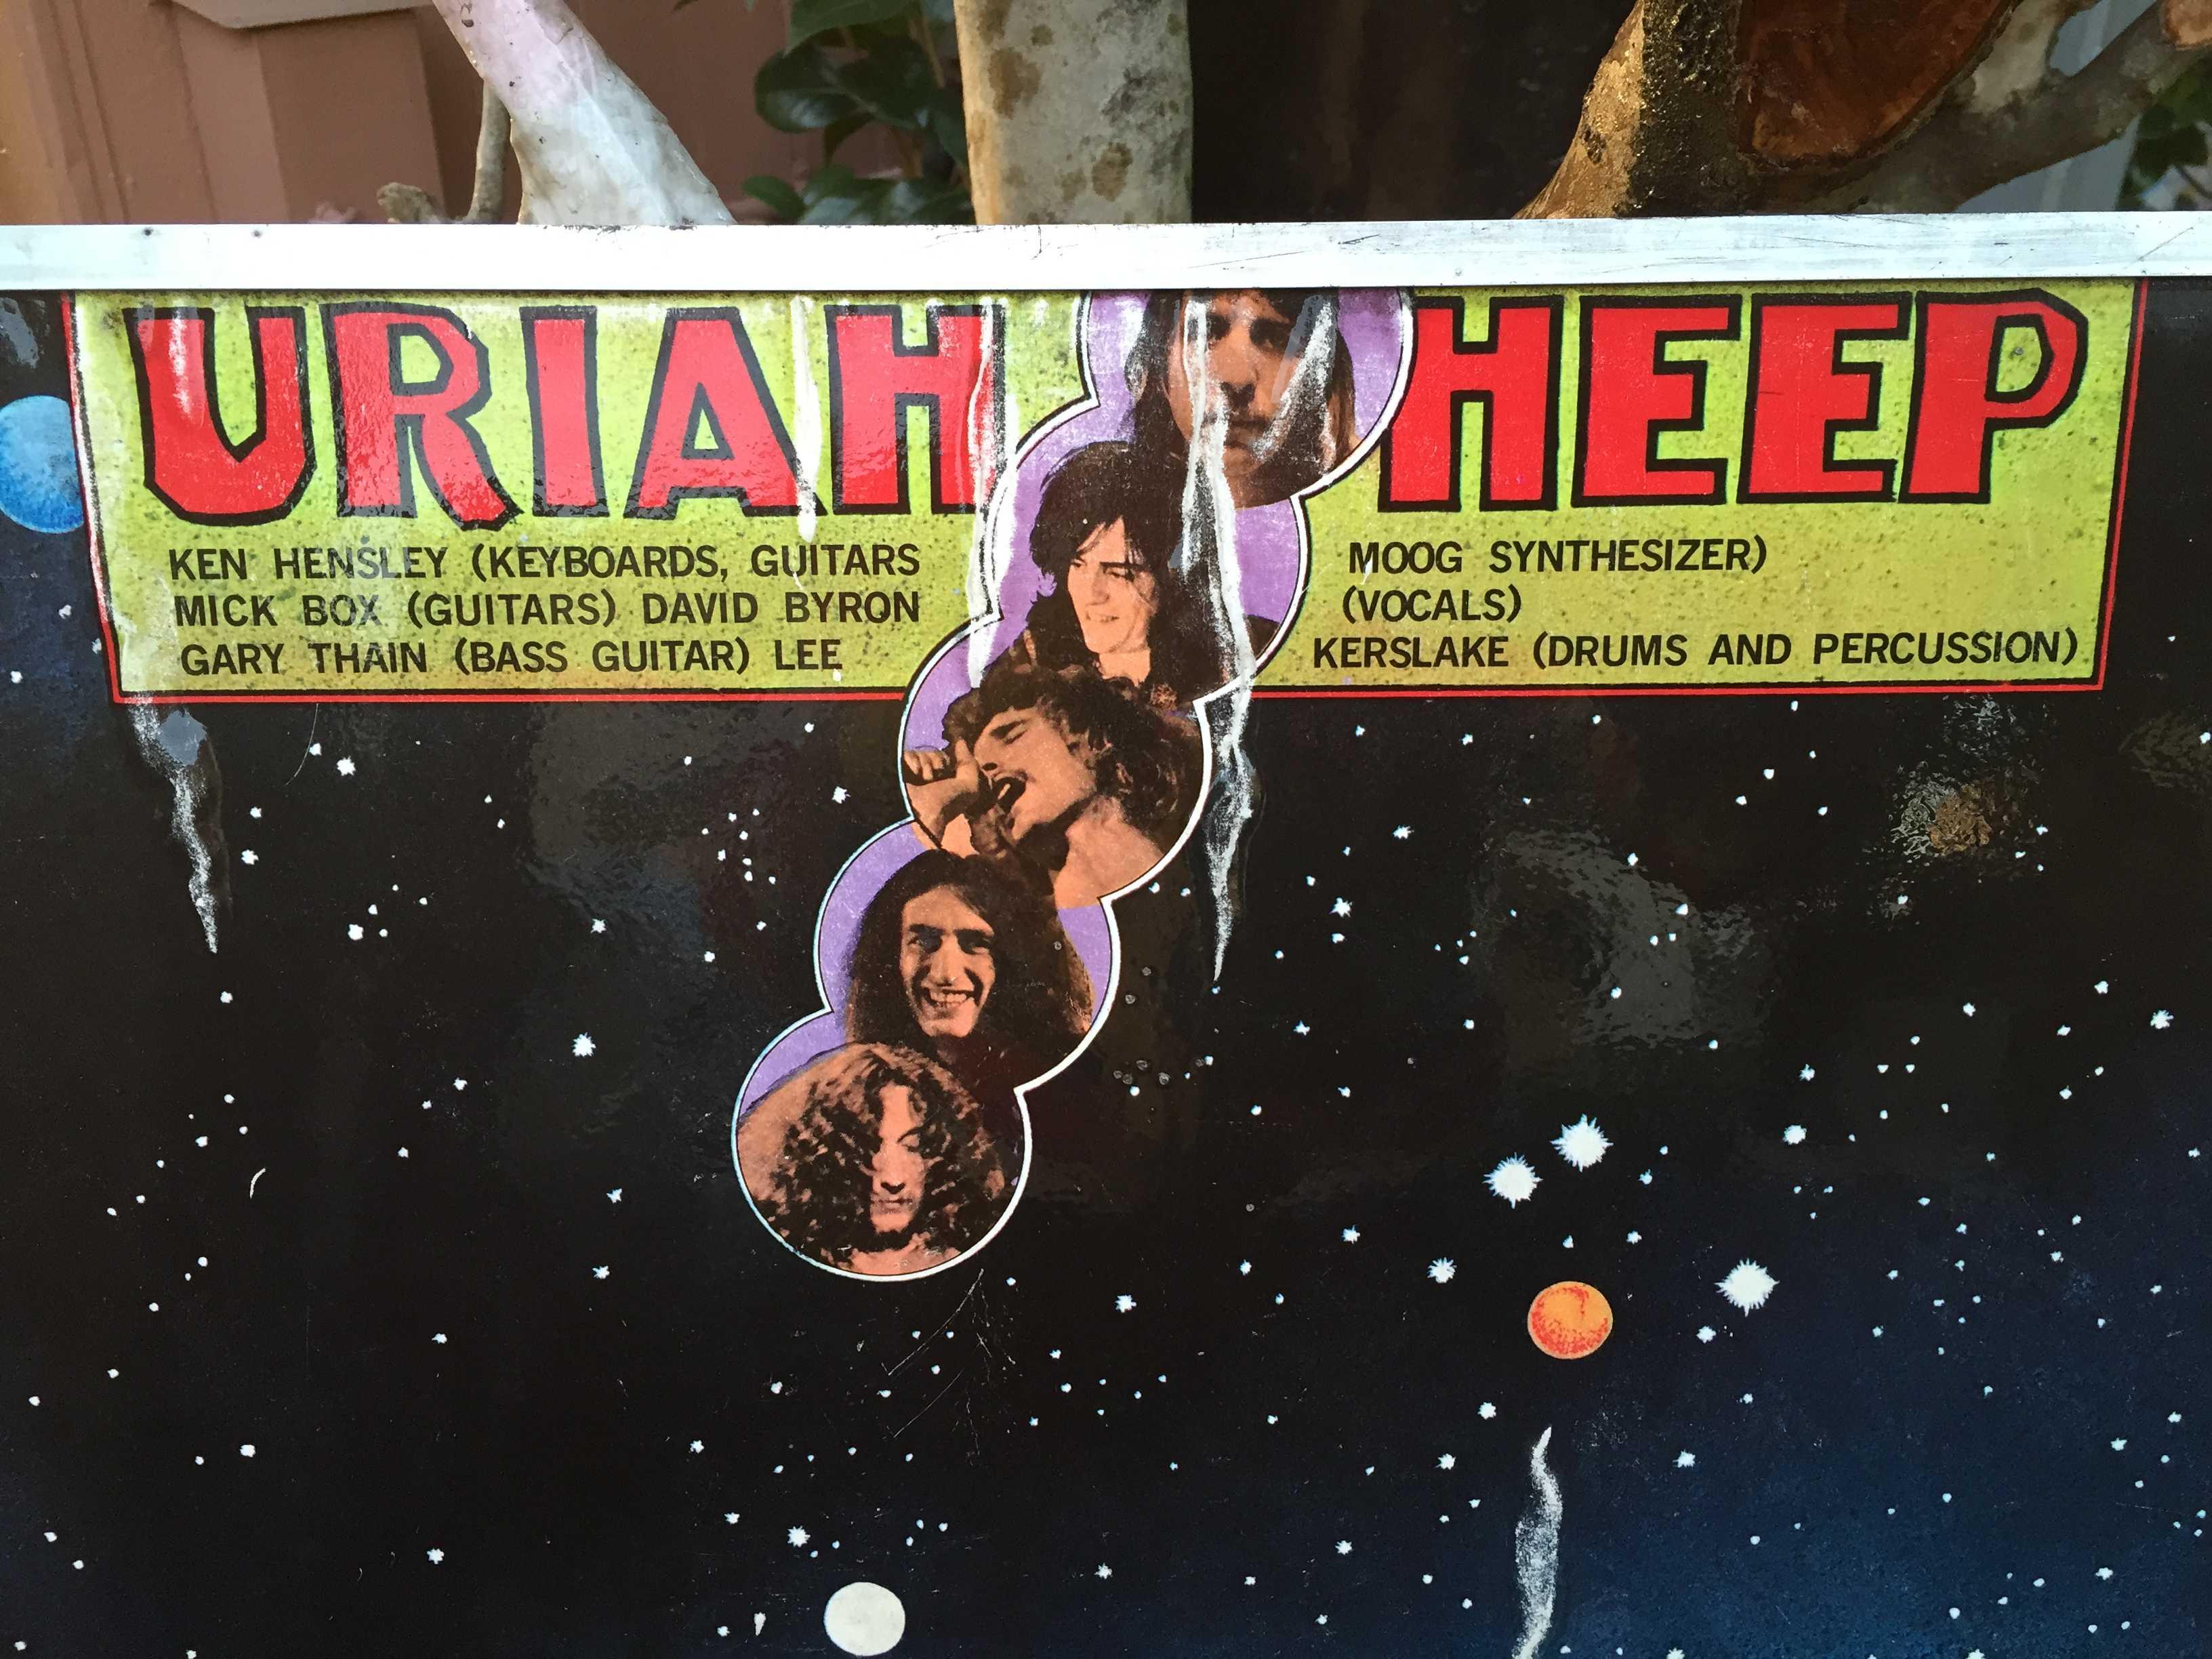 URIAH HEEP(ユーライア・ヒープ)